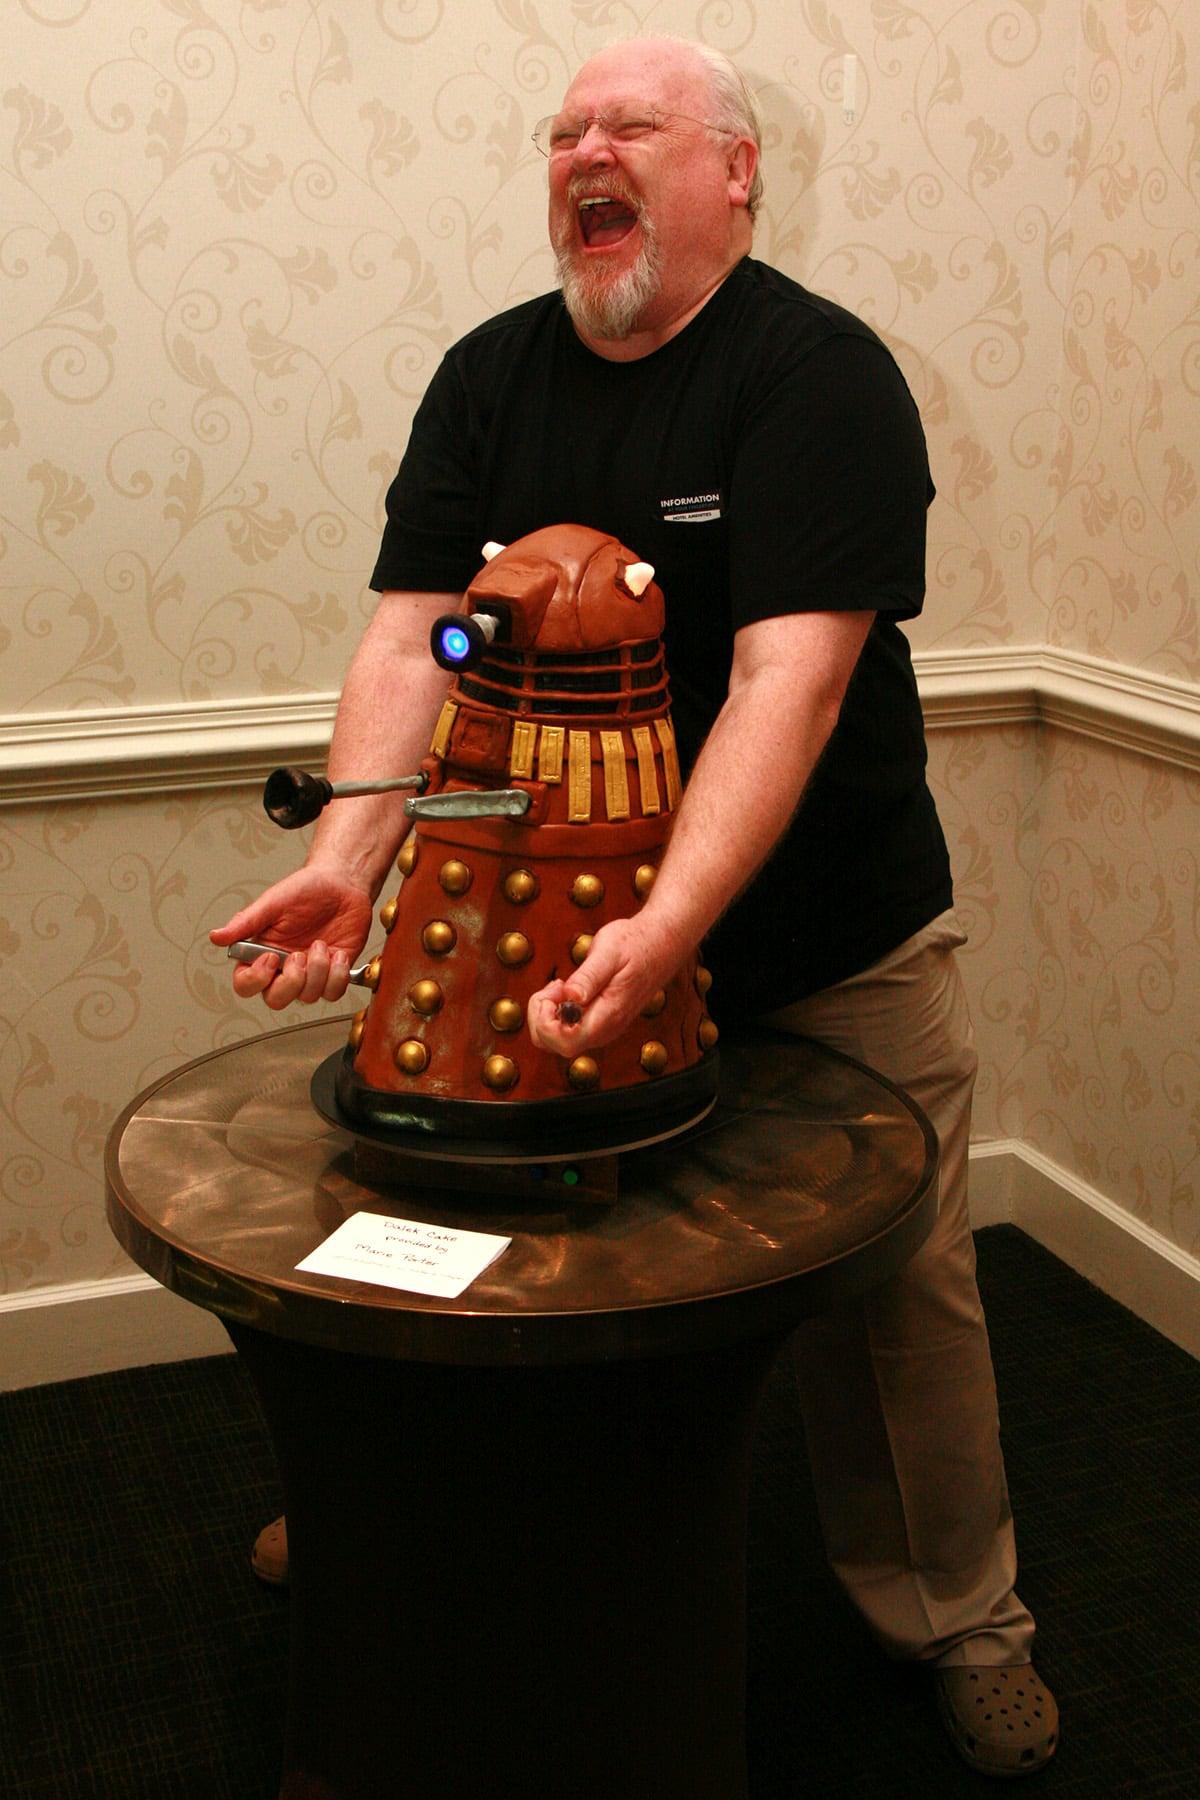 Colin Baker jams 2 serving knives into the Dalek Cake while posing.